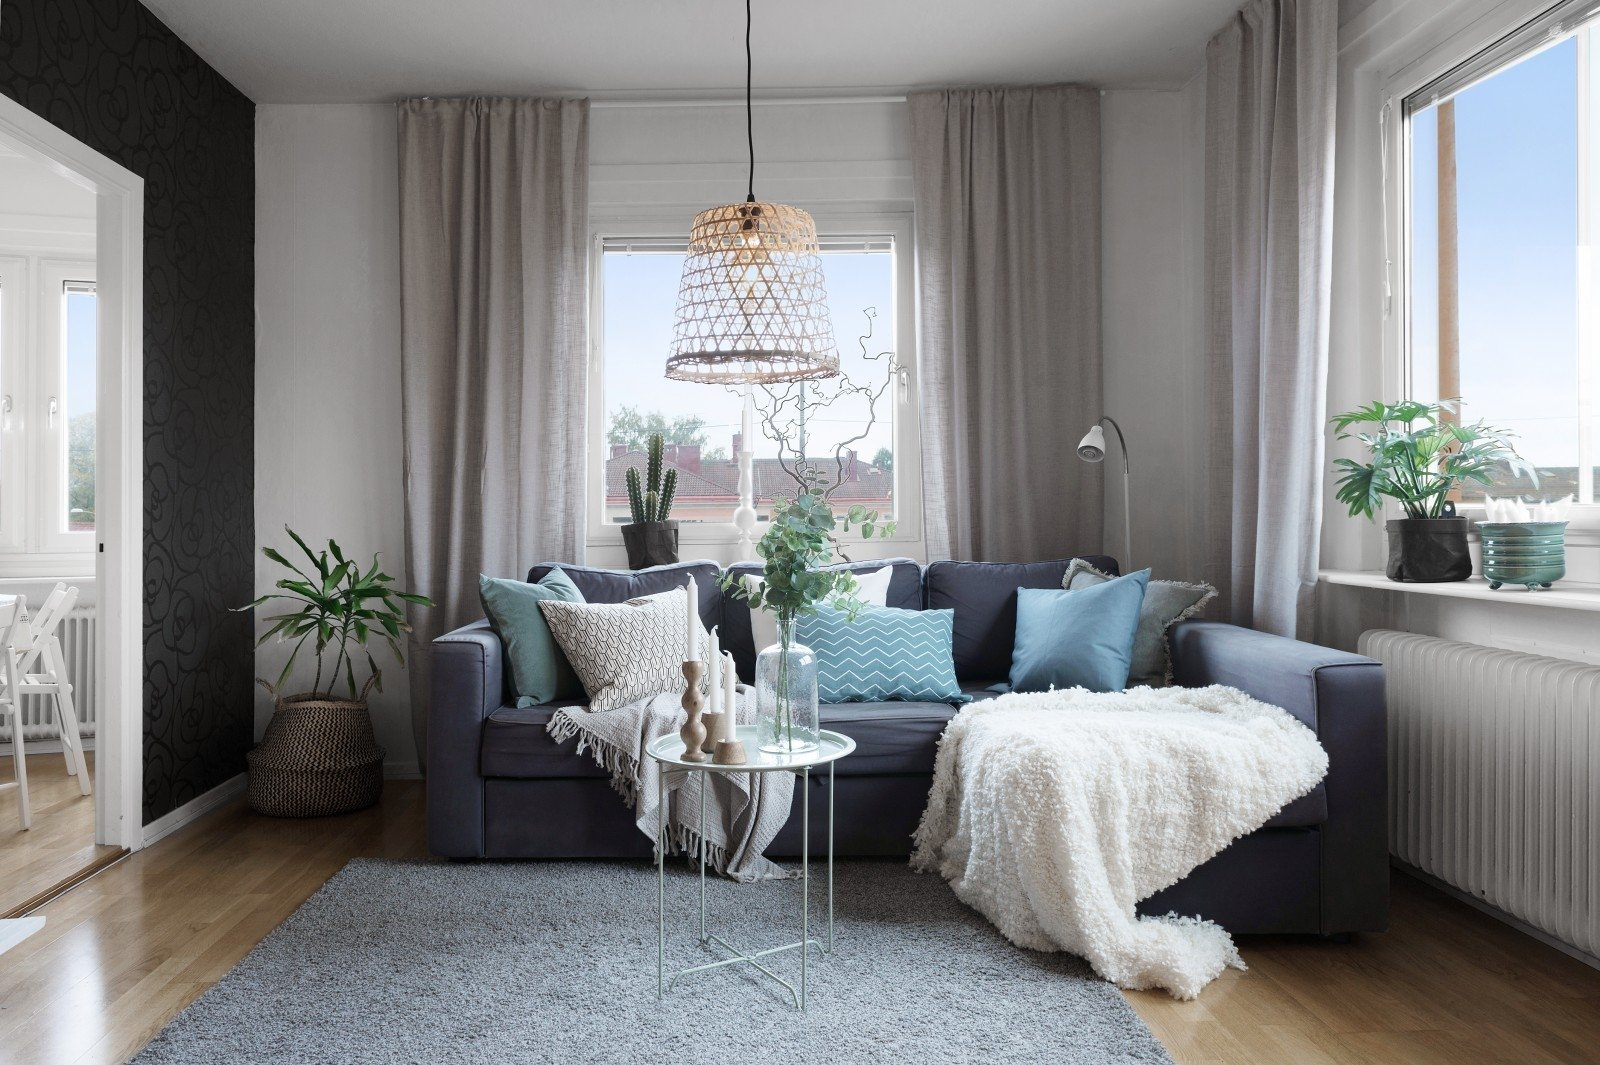 interjero specialist s patarimai kaip susikurti gra ius namus delfi b stas. Black Bedroom Furniture Sets. Home Design Ideas